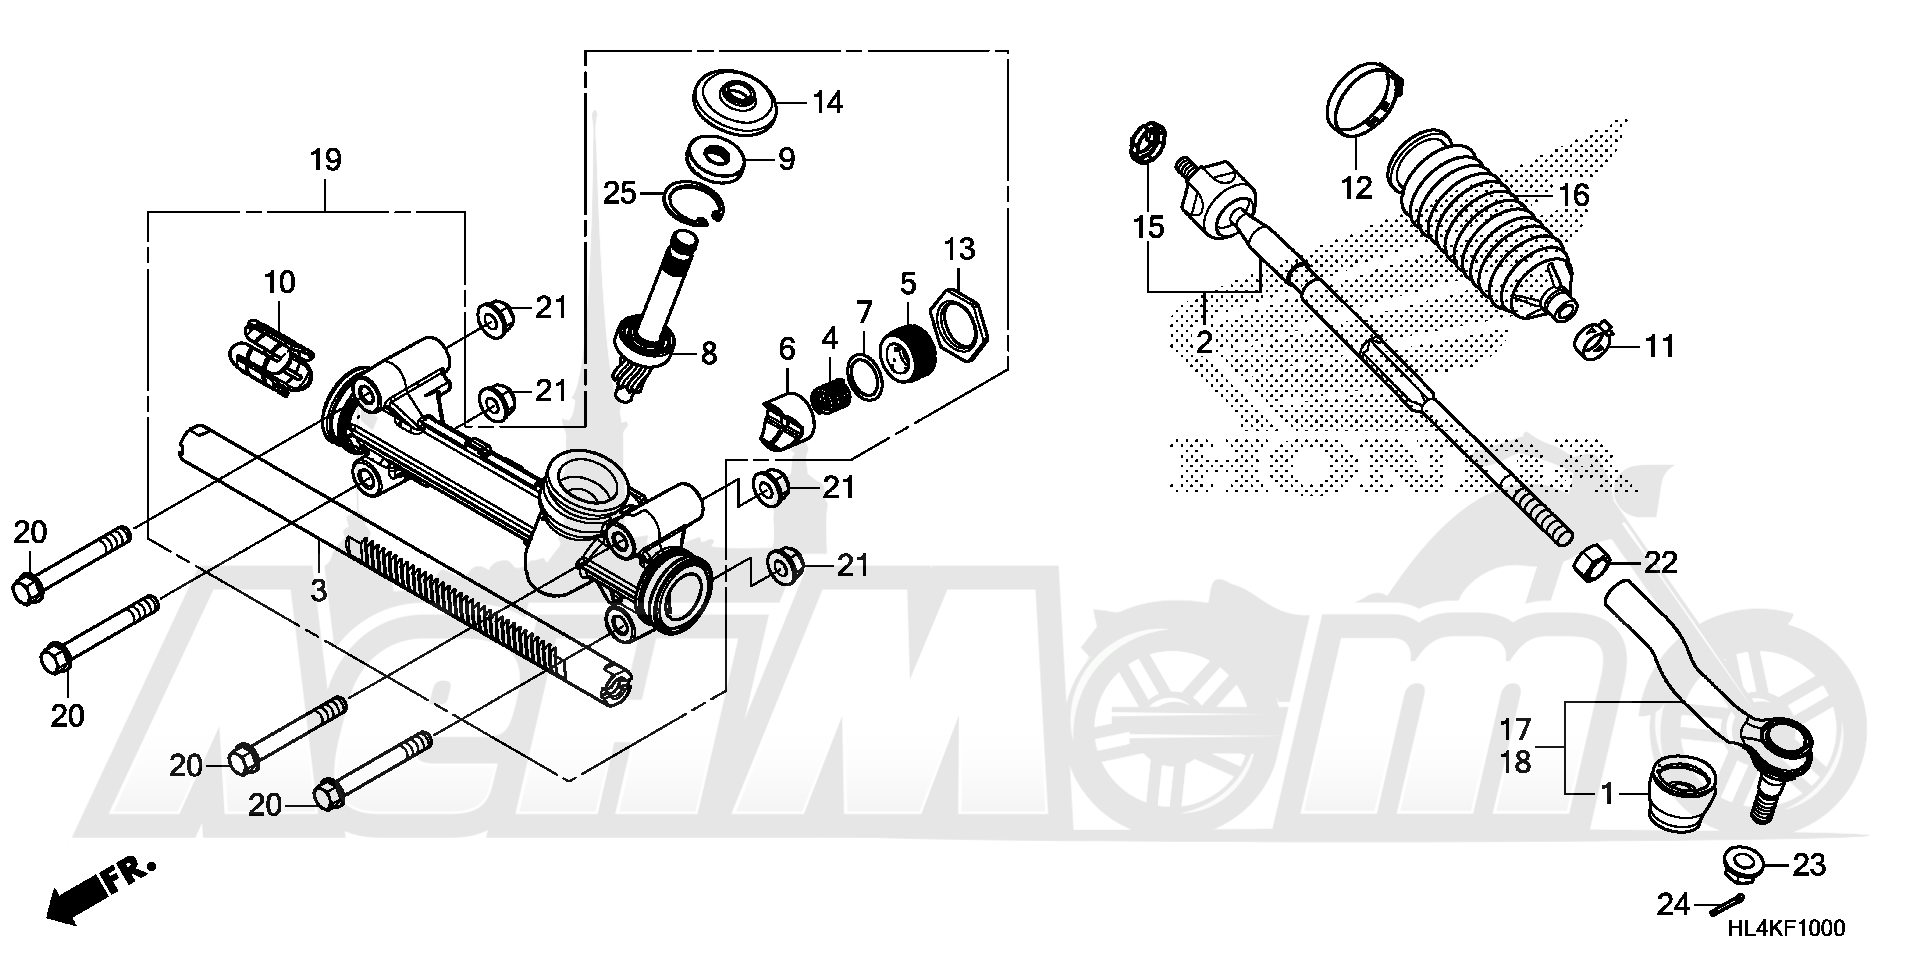 Запчасти для Квадроцикла Honda 2019 SXS1000M5P Раздел: STEERING GEAR BOX AND TIE ROD | рулевое управление коробка передач и рулевая тяга